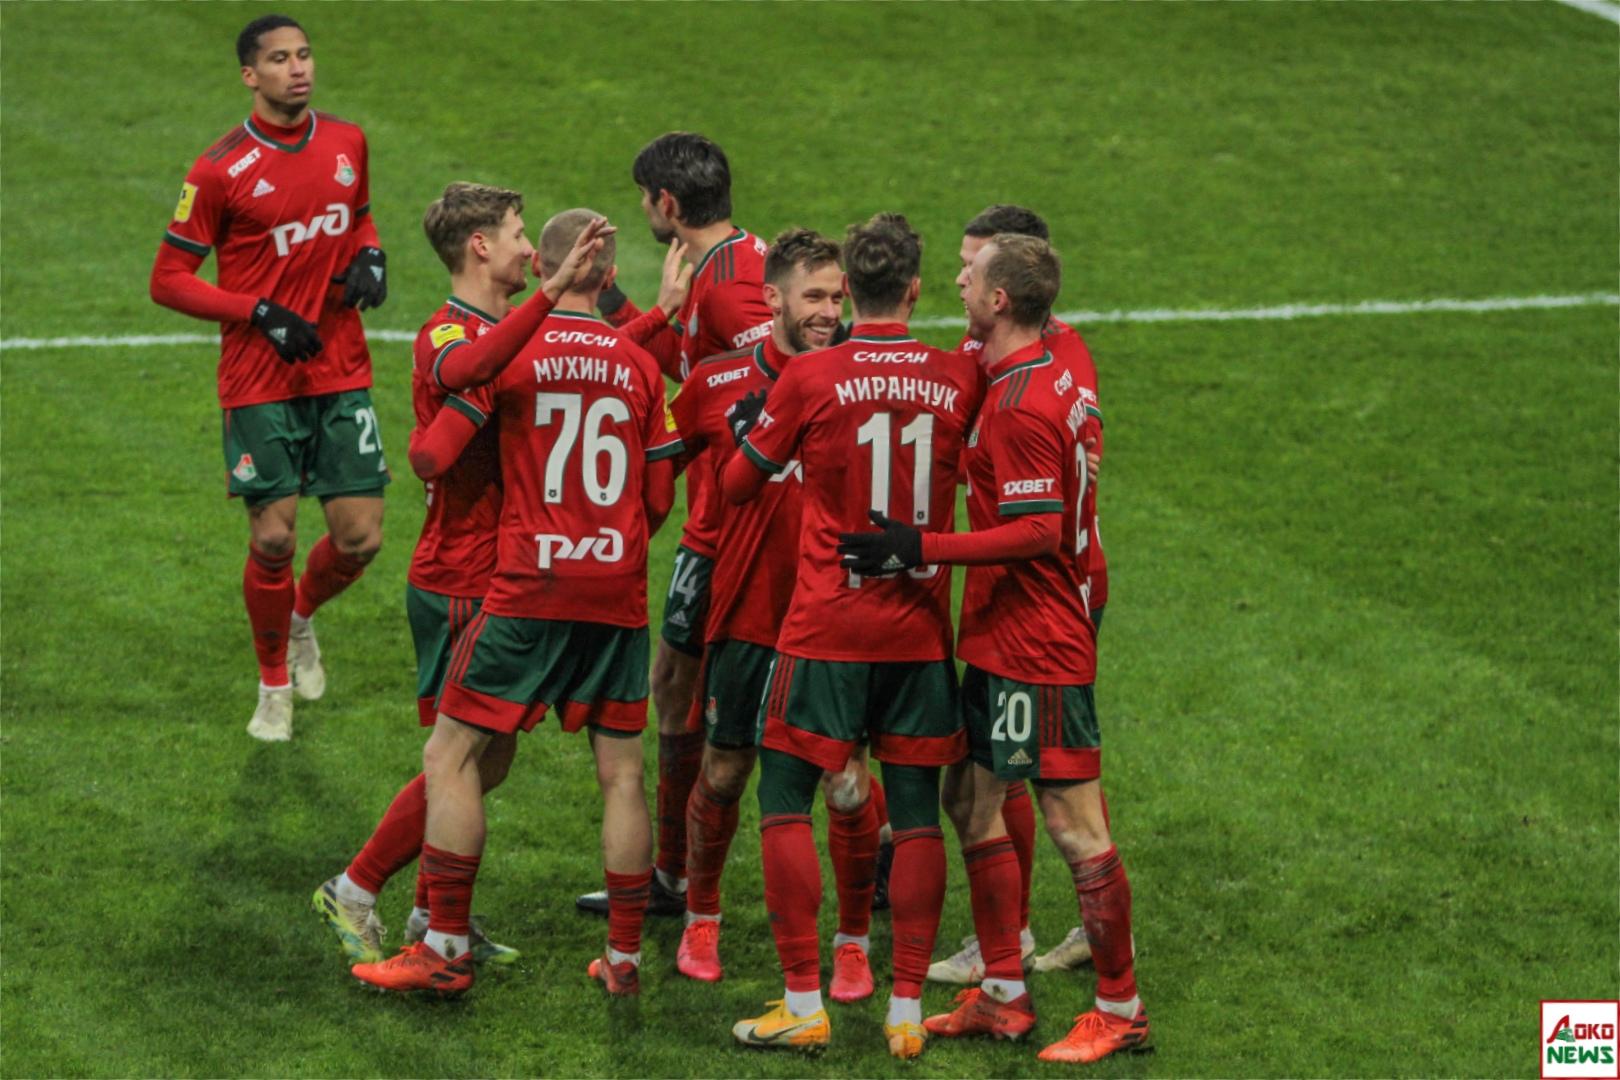 Локомотив - Рубин. Фото: Дмитрий Бурдонов / Loko.News